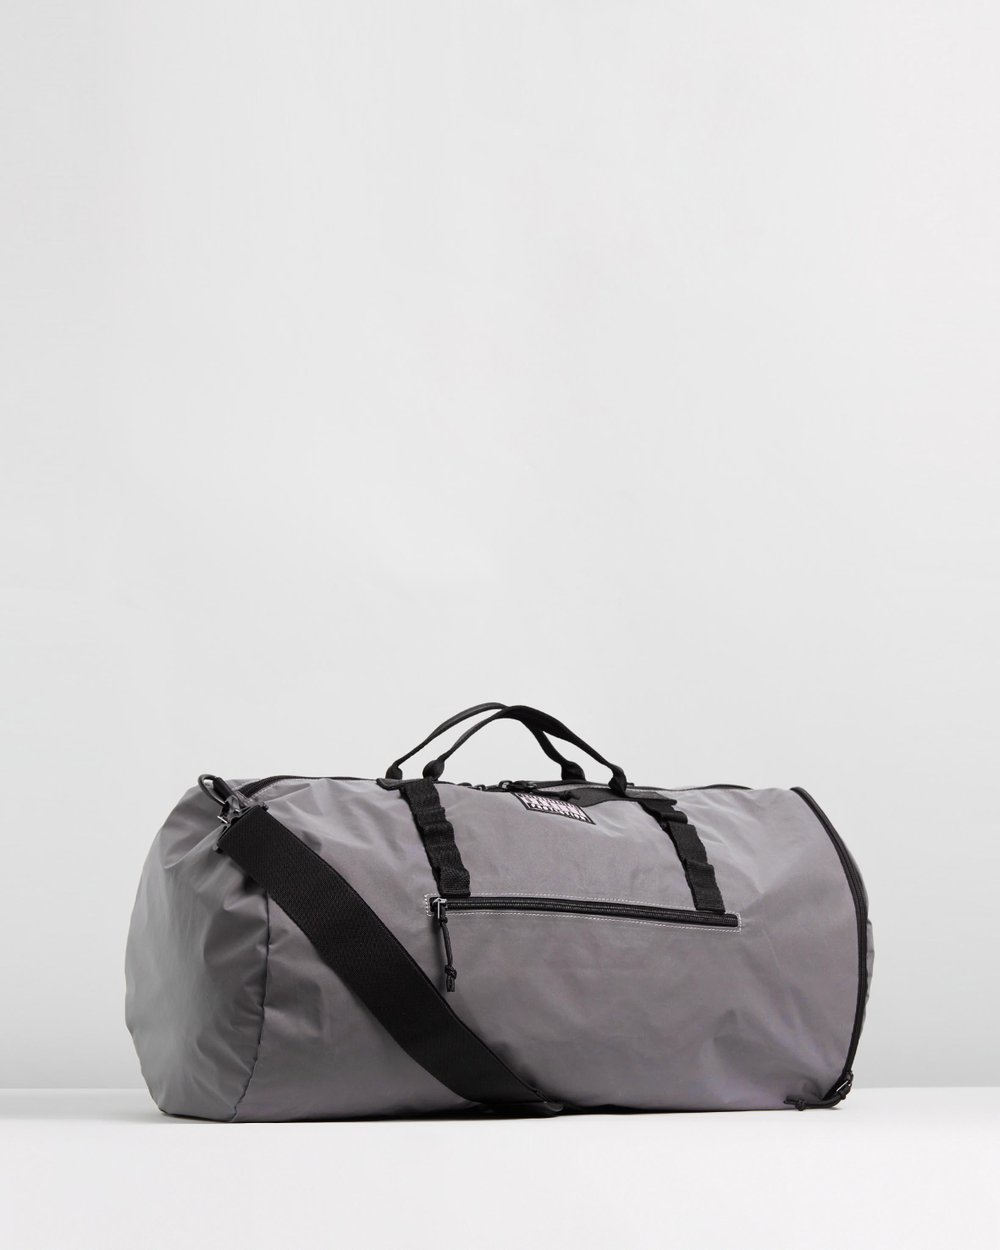 TNP Reflective Duffle Bag by Oakley Online  28c8551187e31